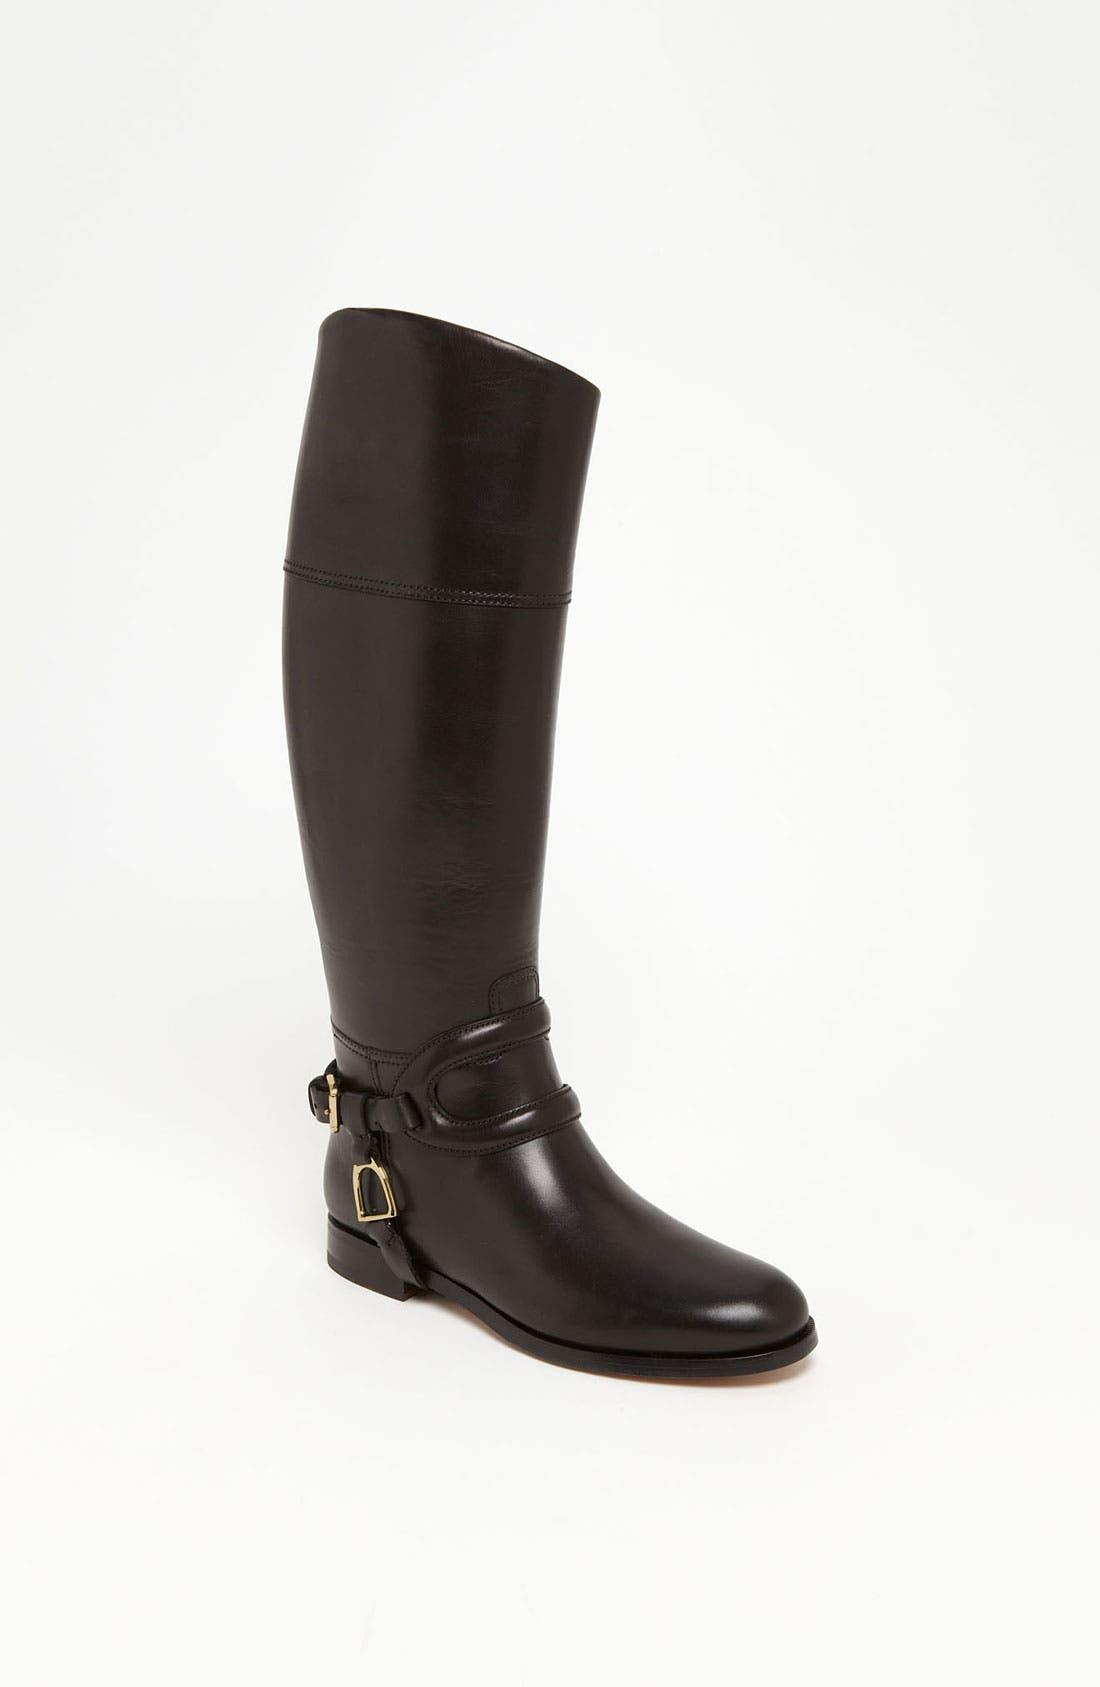 Alternate Image 1 Selected - Ralph Lauren Collection 'Sabella' Boot